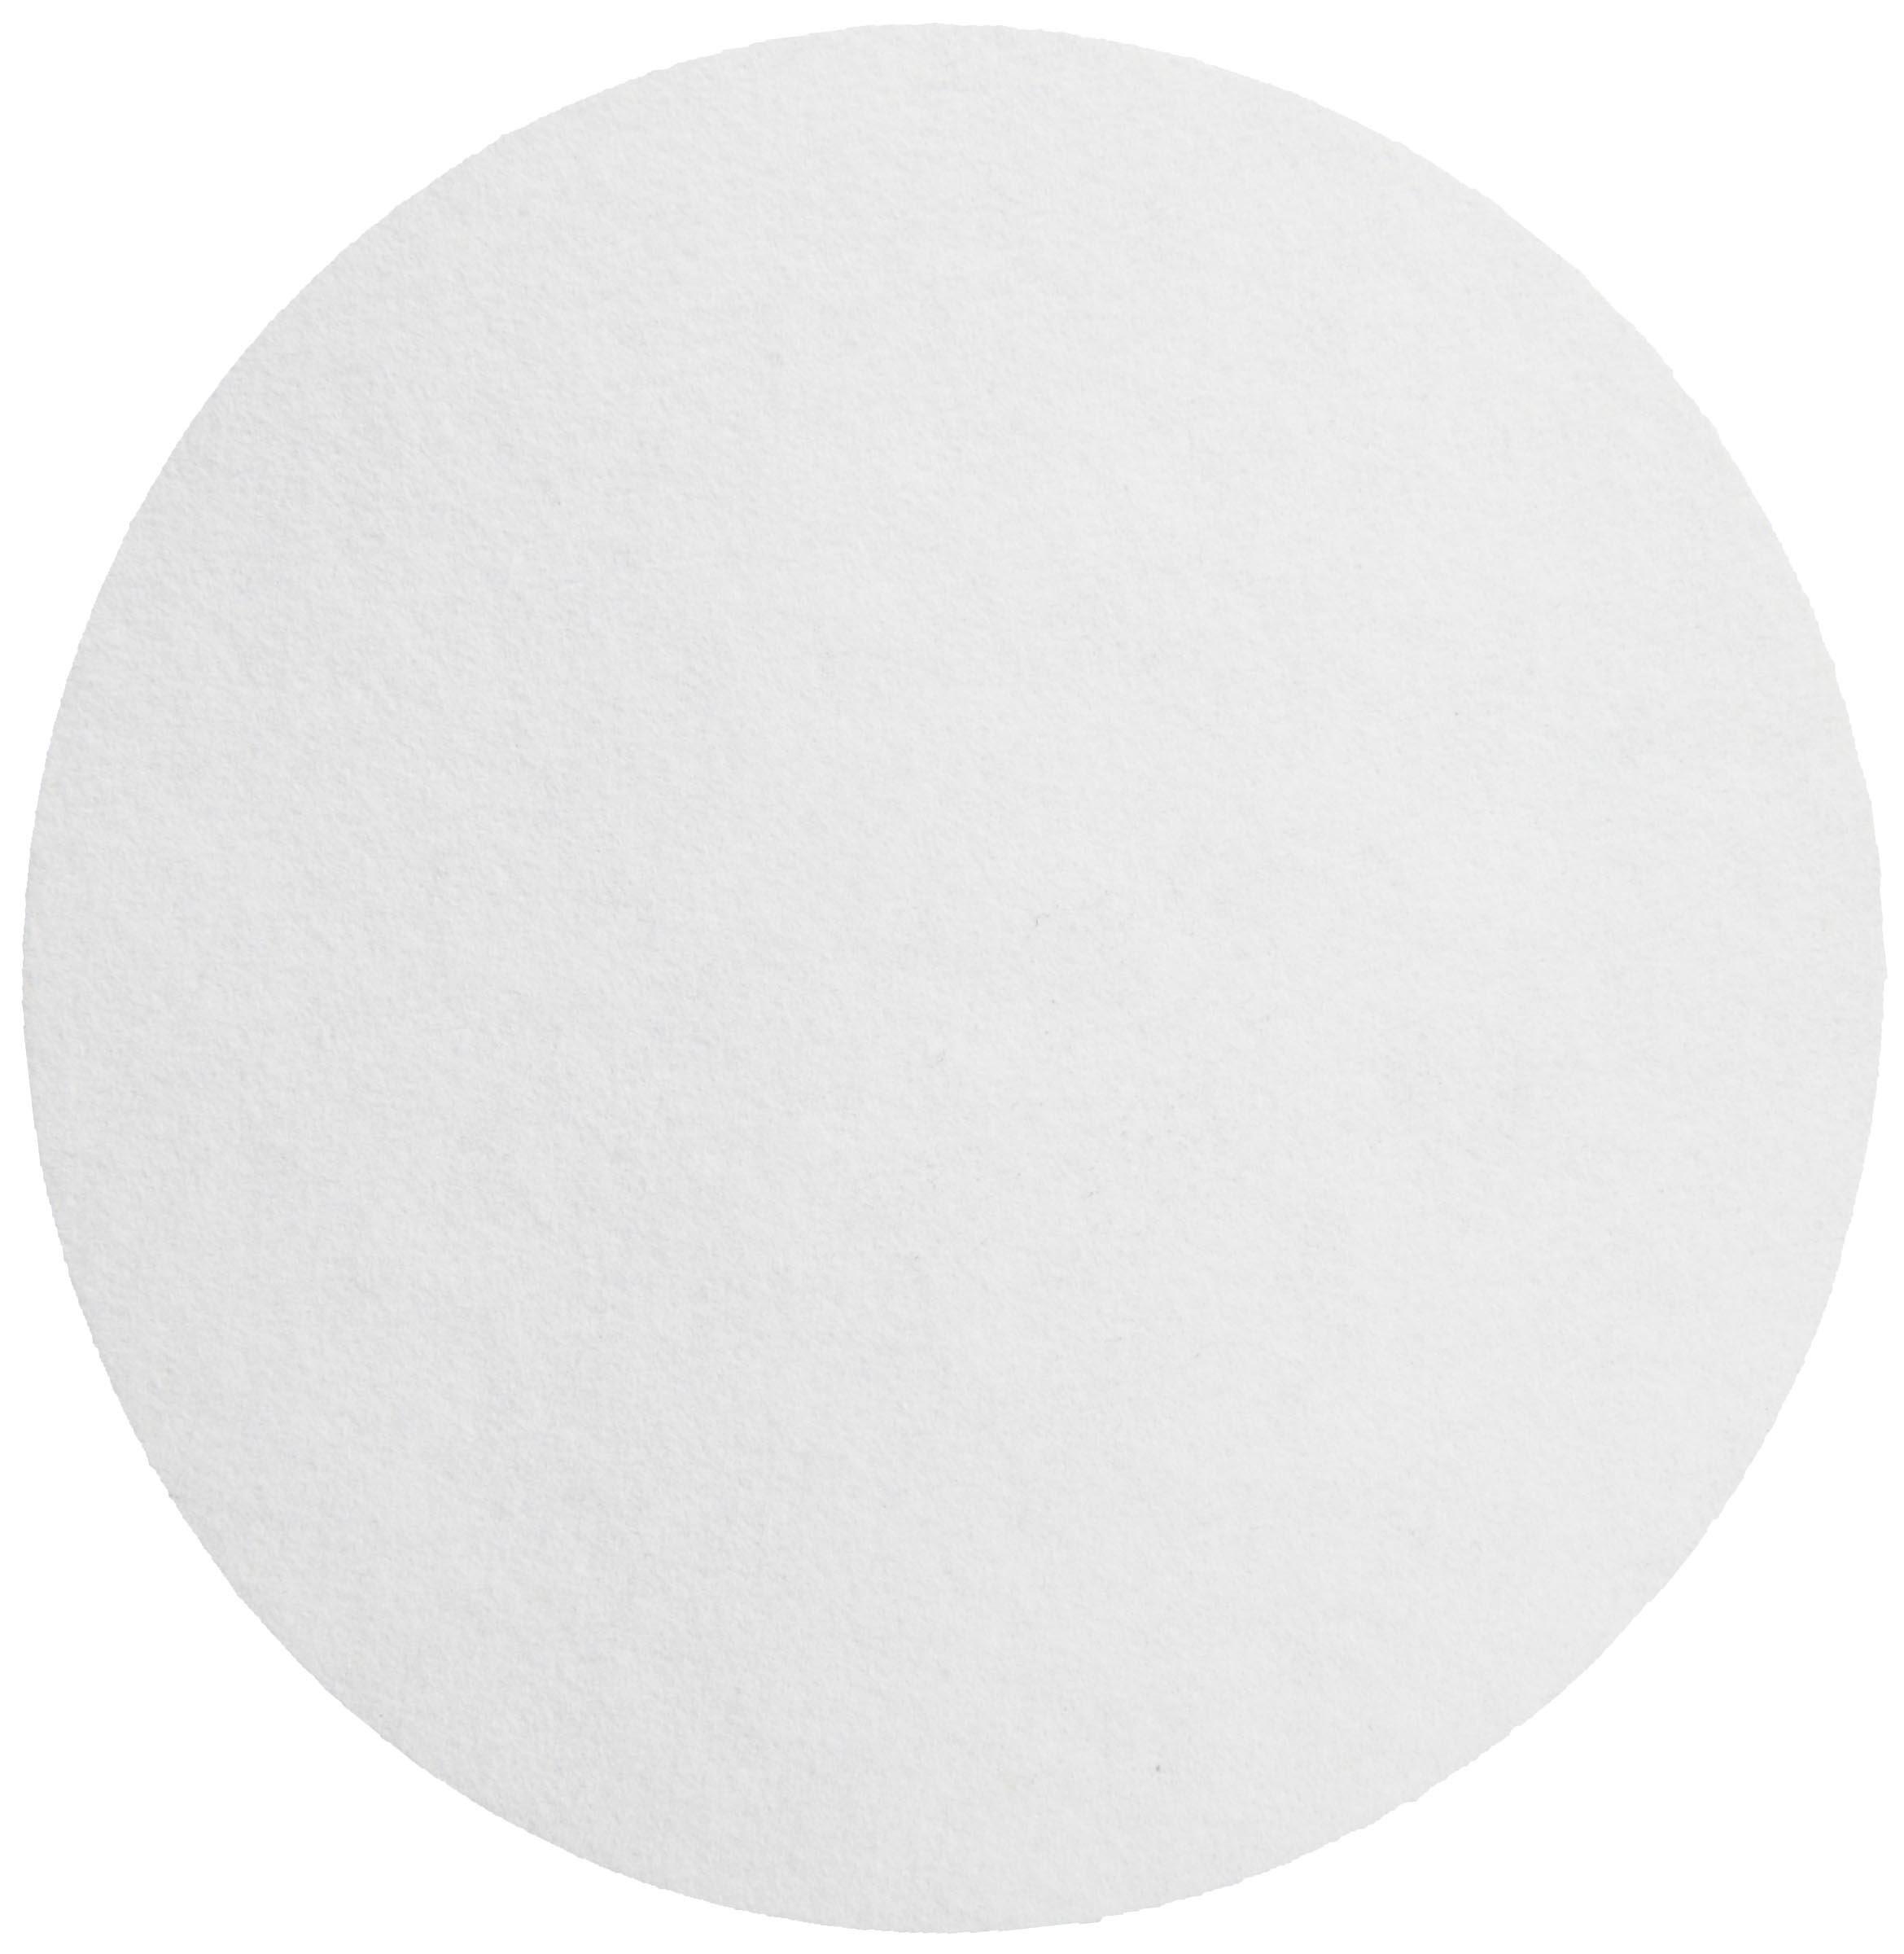 Whatman 1442-150 Ashless Quantitative Filter Paper, 15.0cm Diameter, 2.5 Micron, Grade 42 (Pack of 100) by Whatman